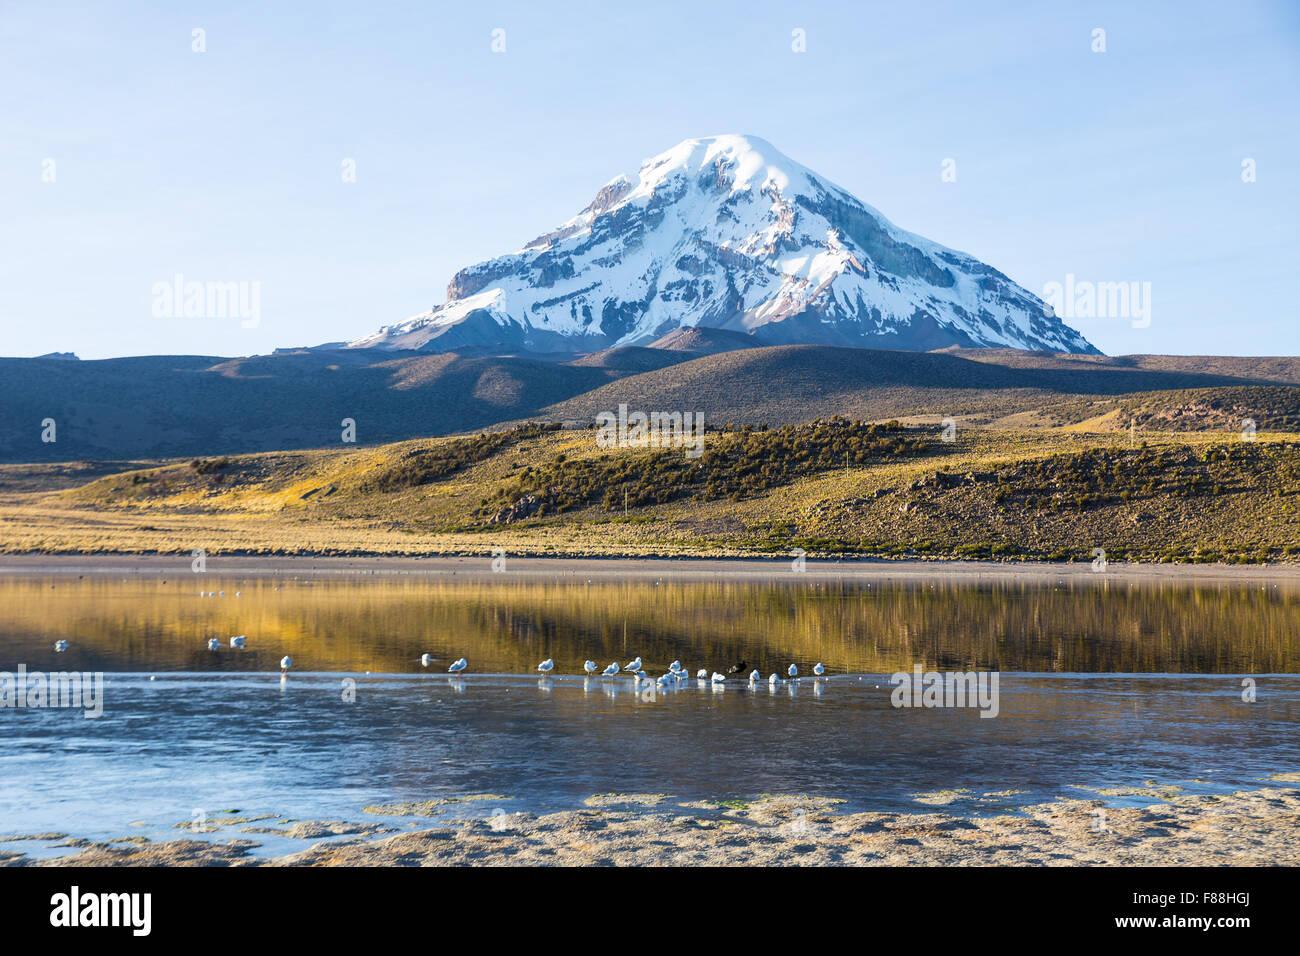 Sajama volcano and lake Huañacota, in the Natural Park of Sajama. Bolivia Stock Photo